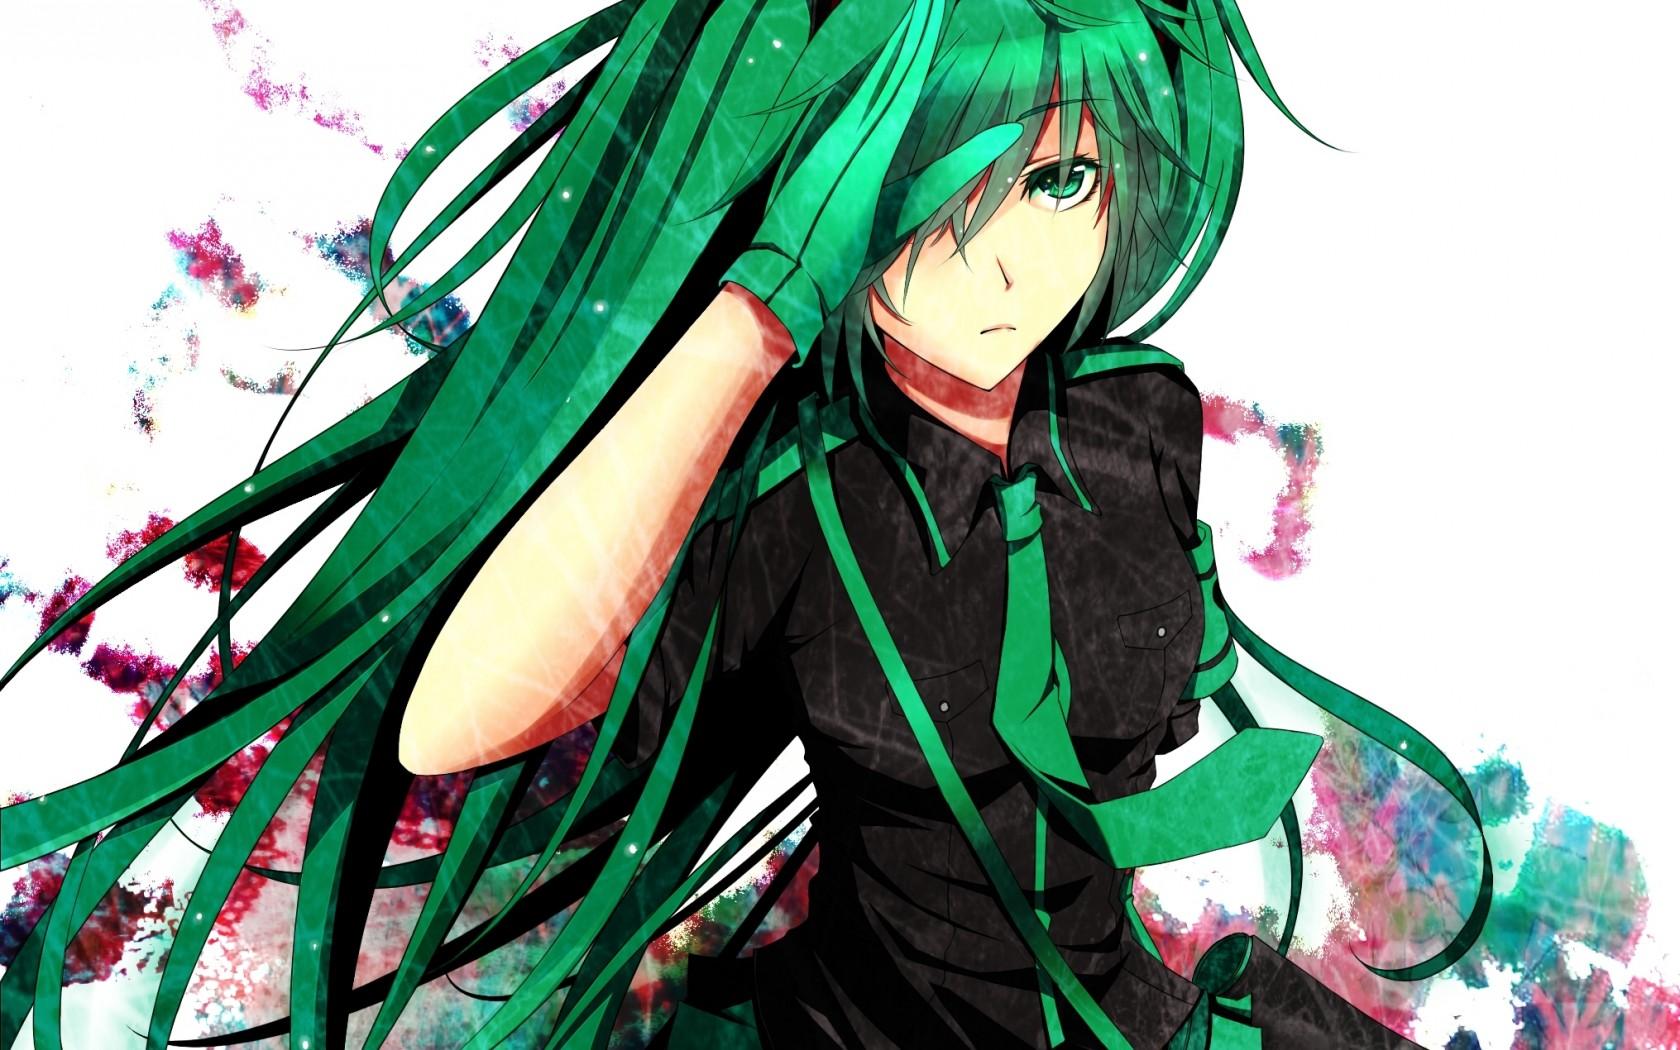 Anime Green Hair Girl #Manga #Illustration #Anime | Anime & Manga